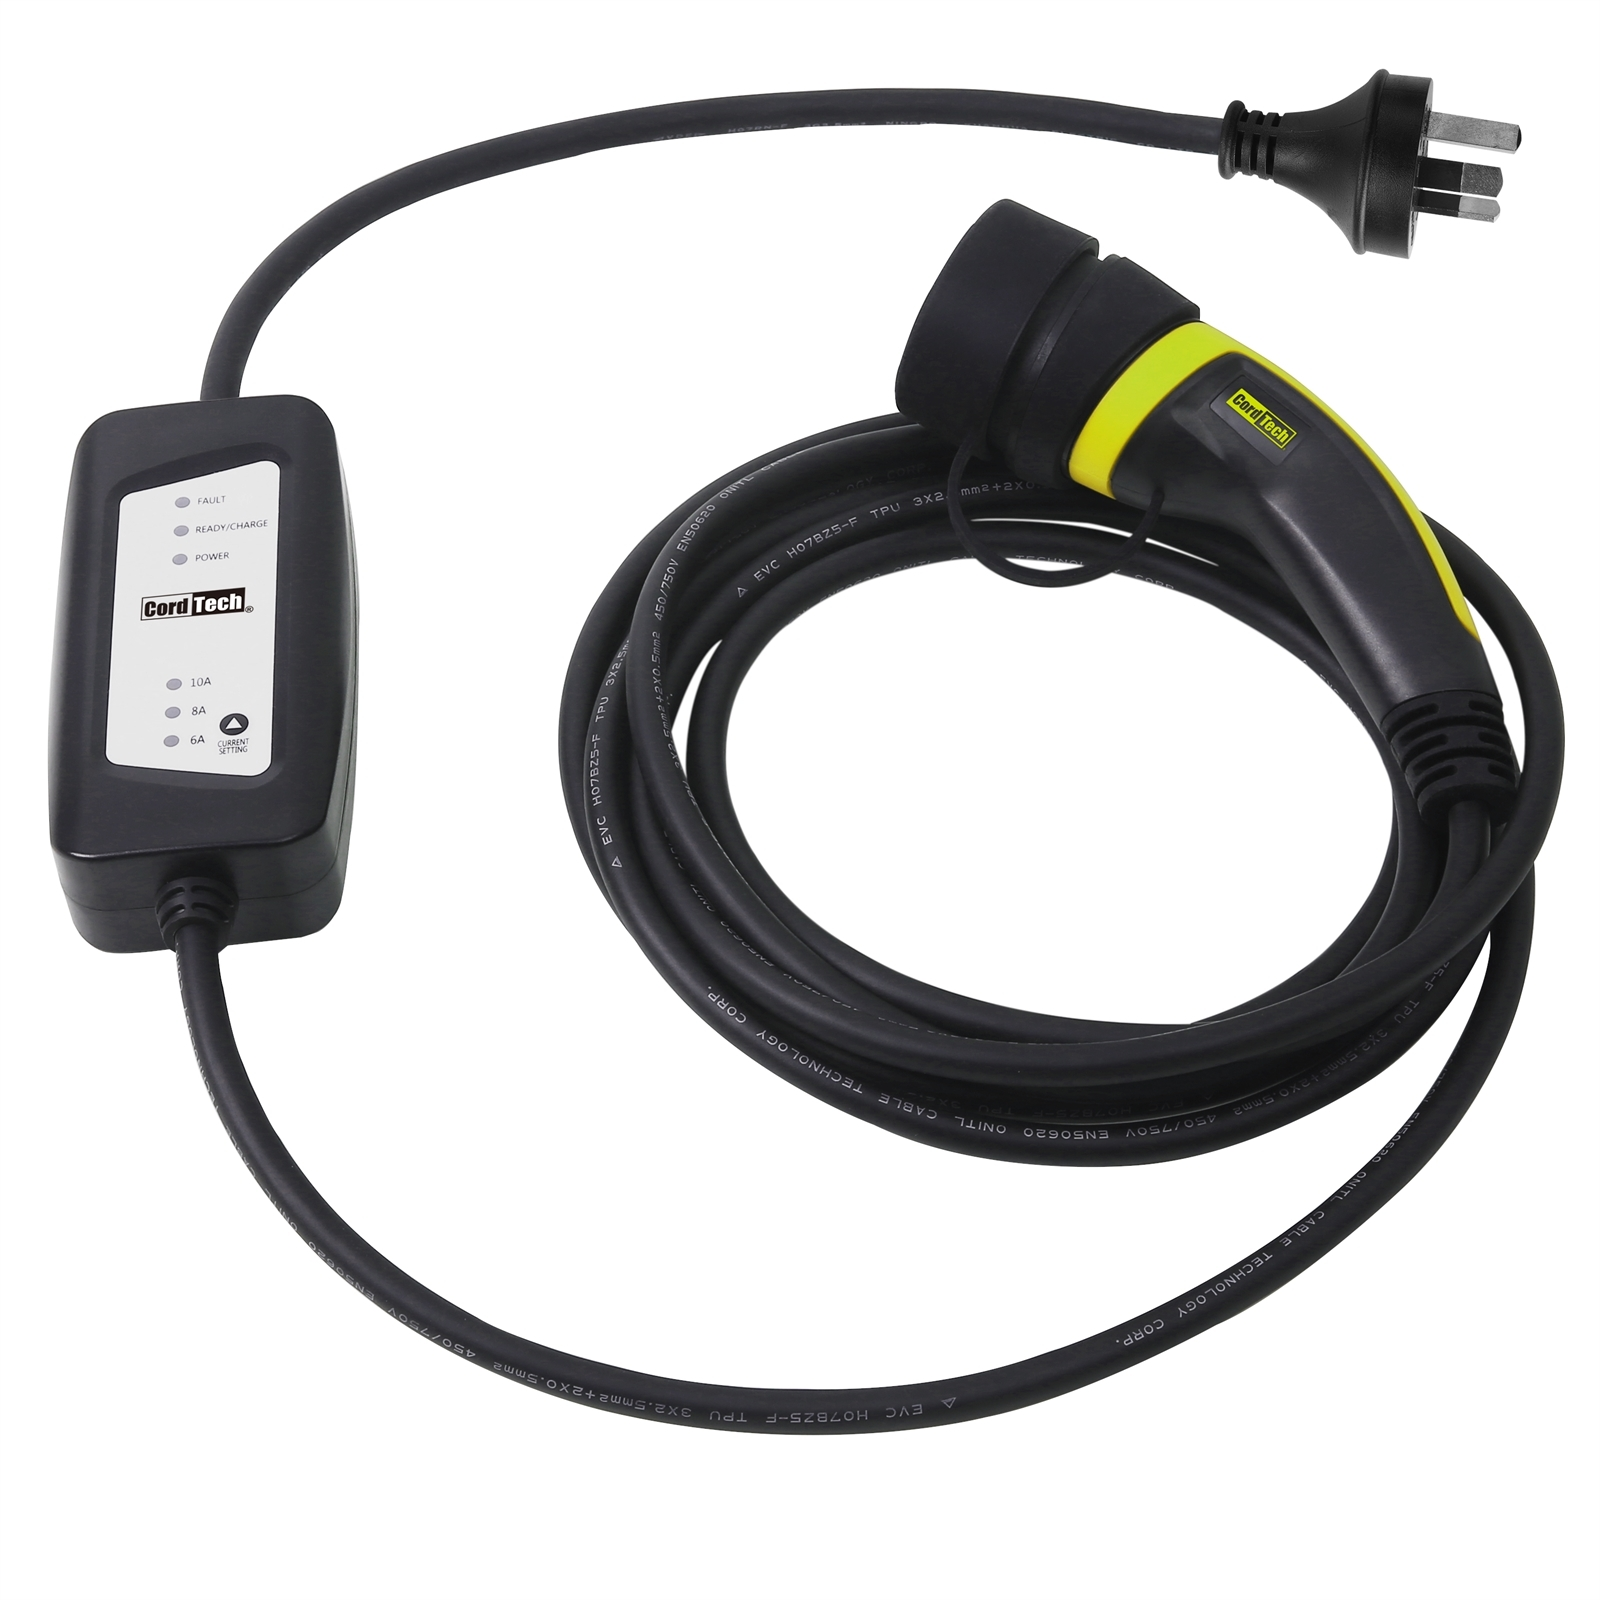 CordTech 5m Mode 2 Type 2 6A 8A 10A EV Charging Cable